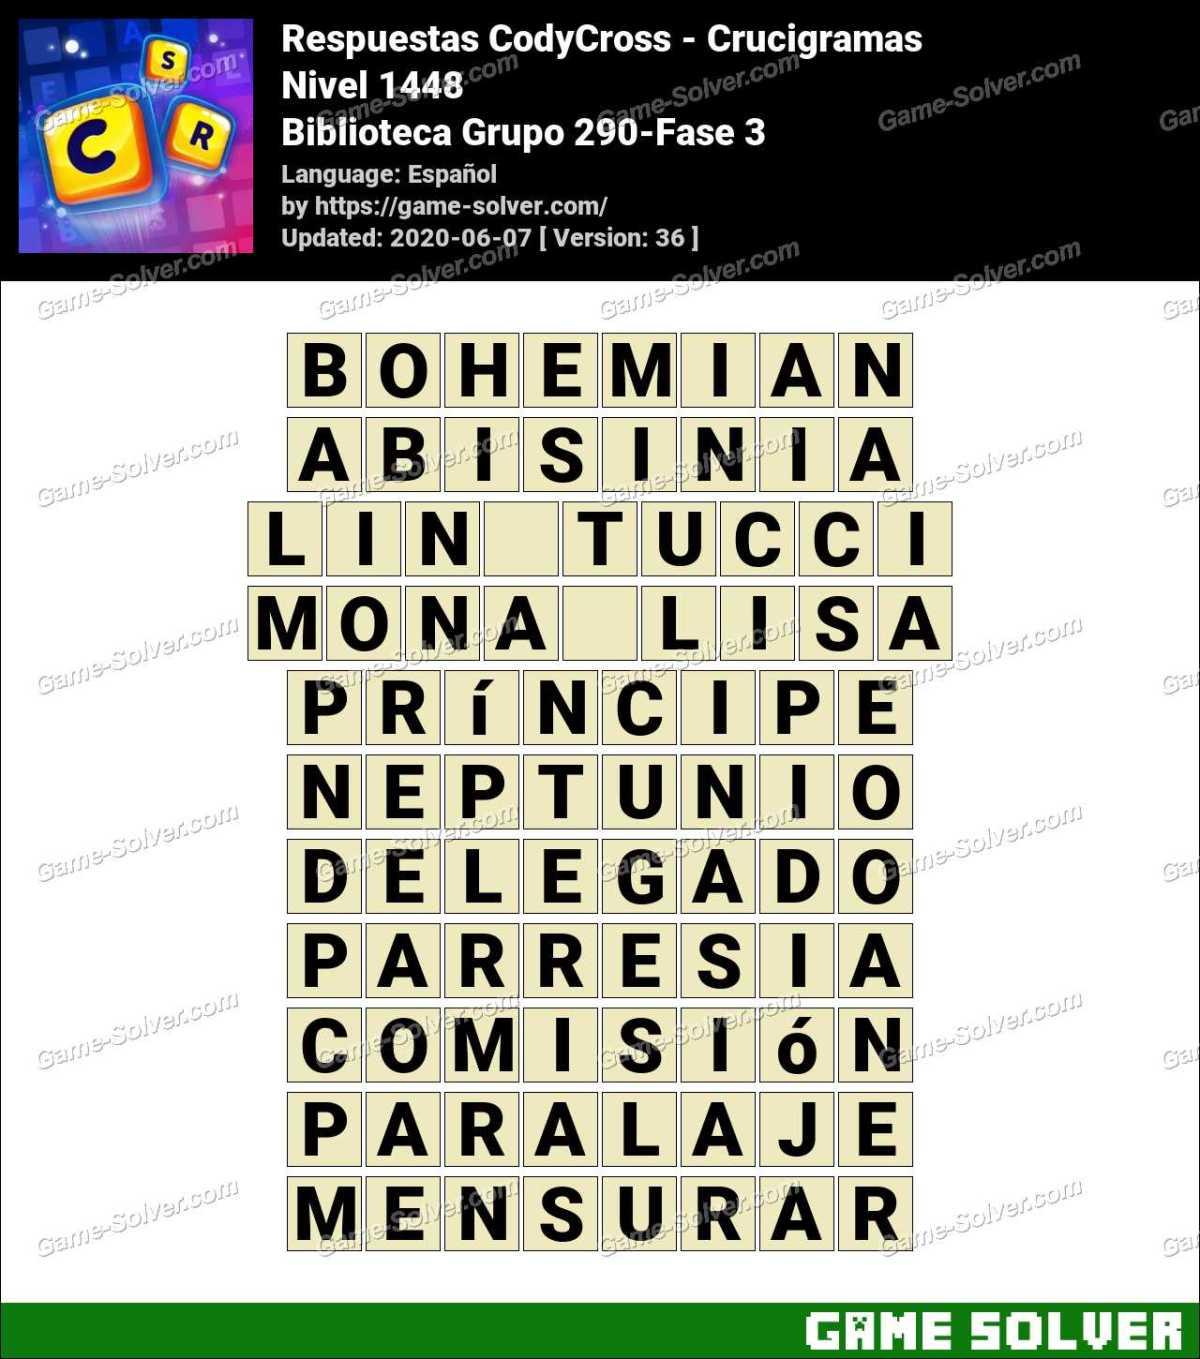 Respuestas CodyCross Biblioteca Grupo 290-Fase 3